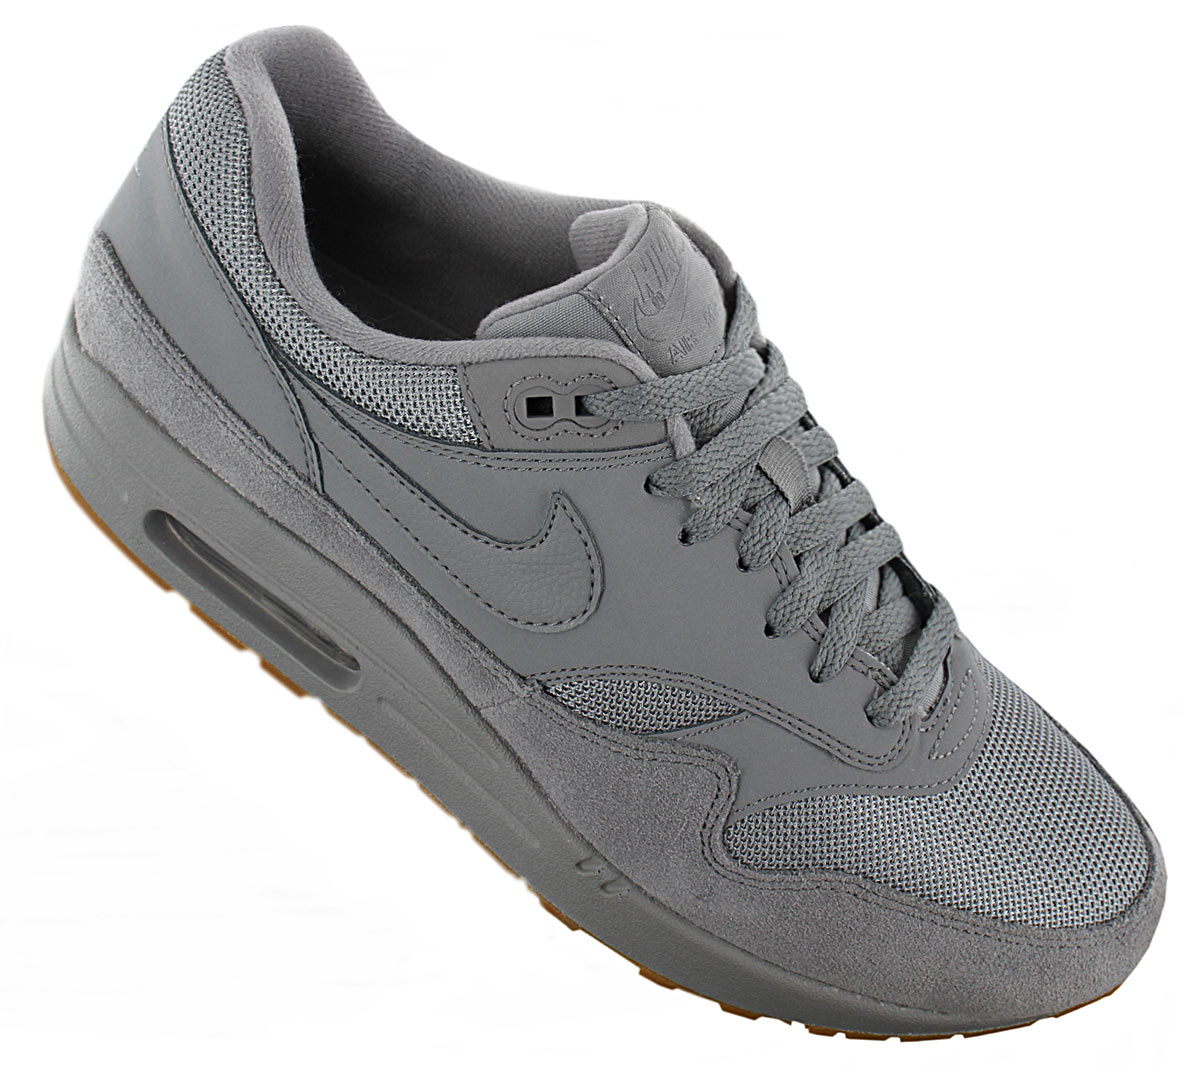 buy popular 54fac 5ff7e Nike Air Max 1 Men s Sneakers Shoes Grey Ah8145-005 Trainers Sport ...